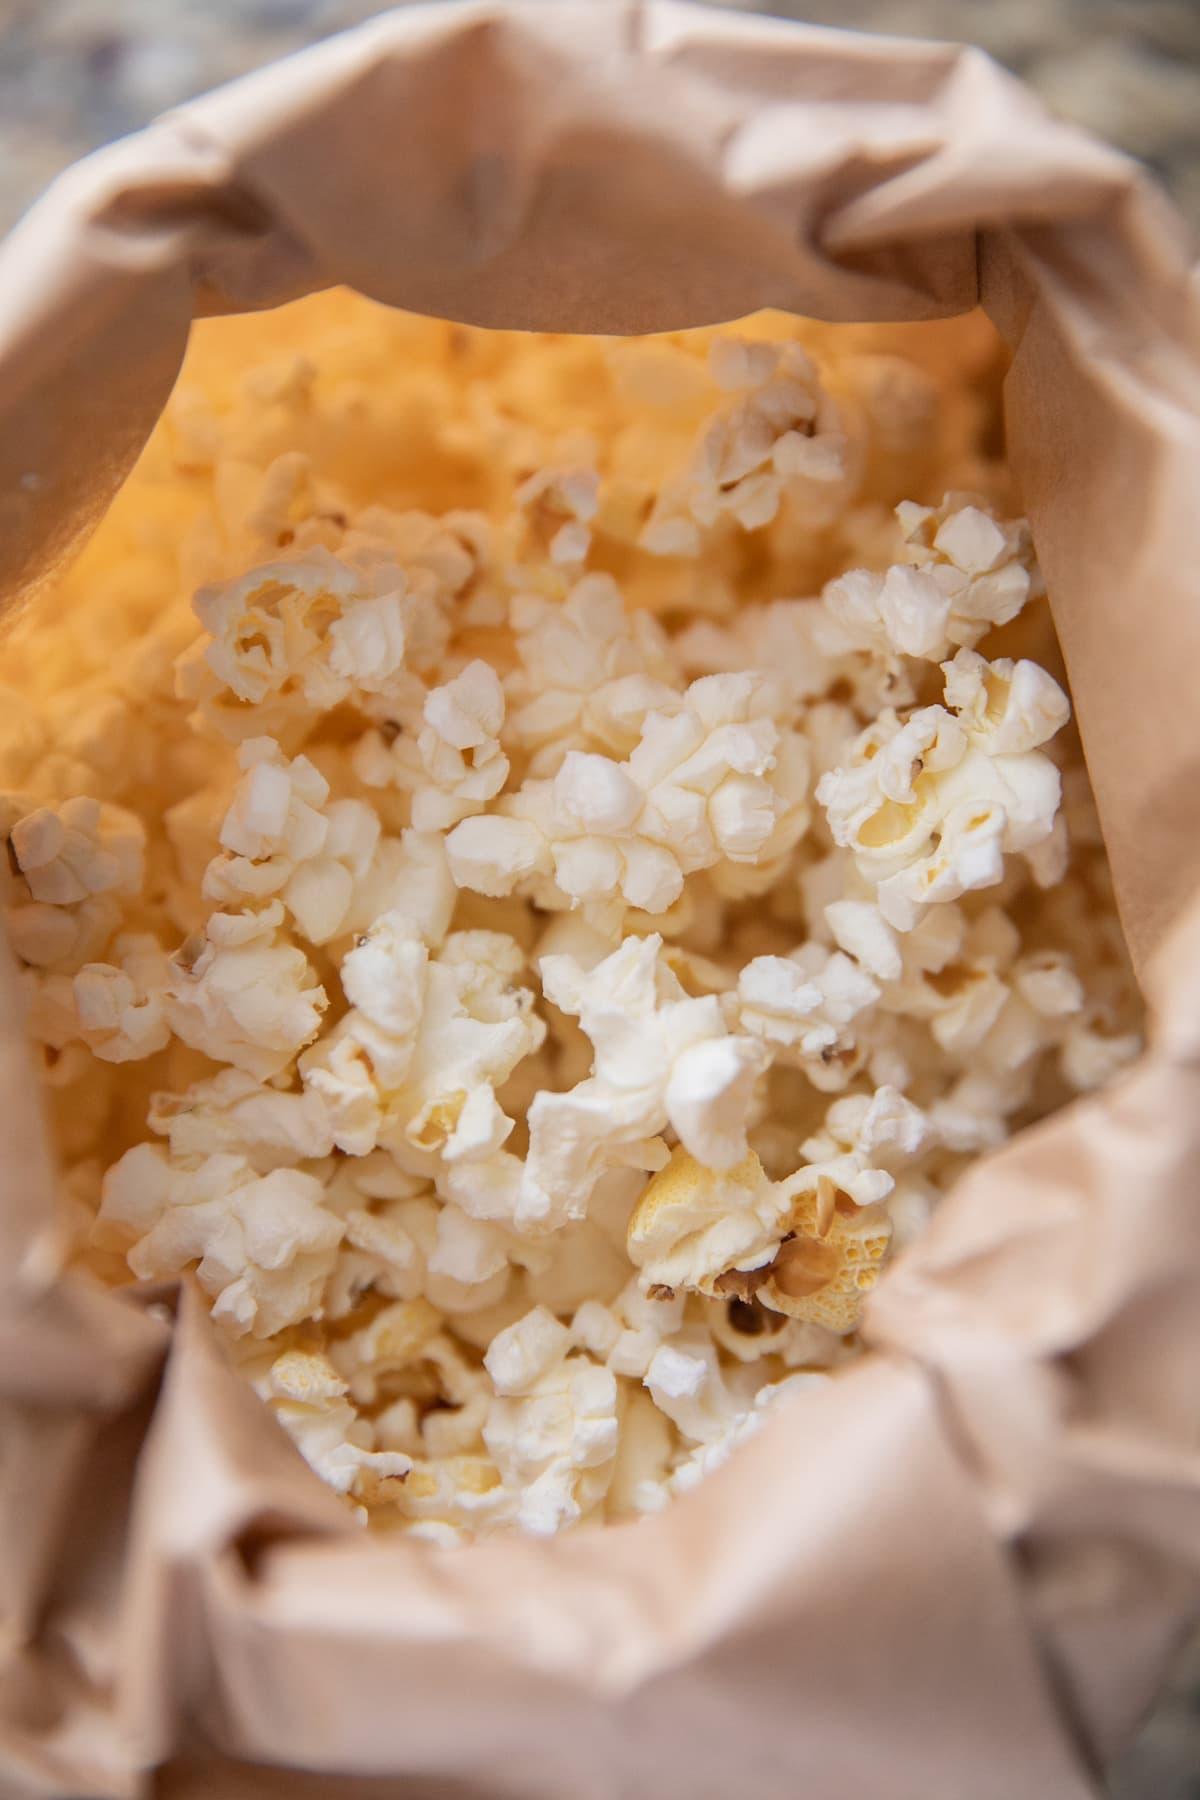 popped popcorn in brown paper bag